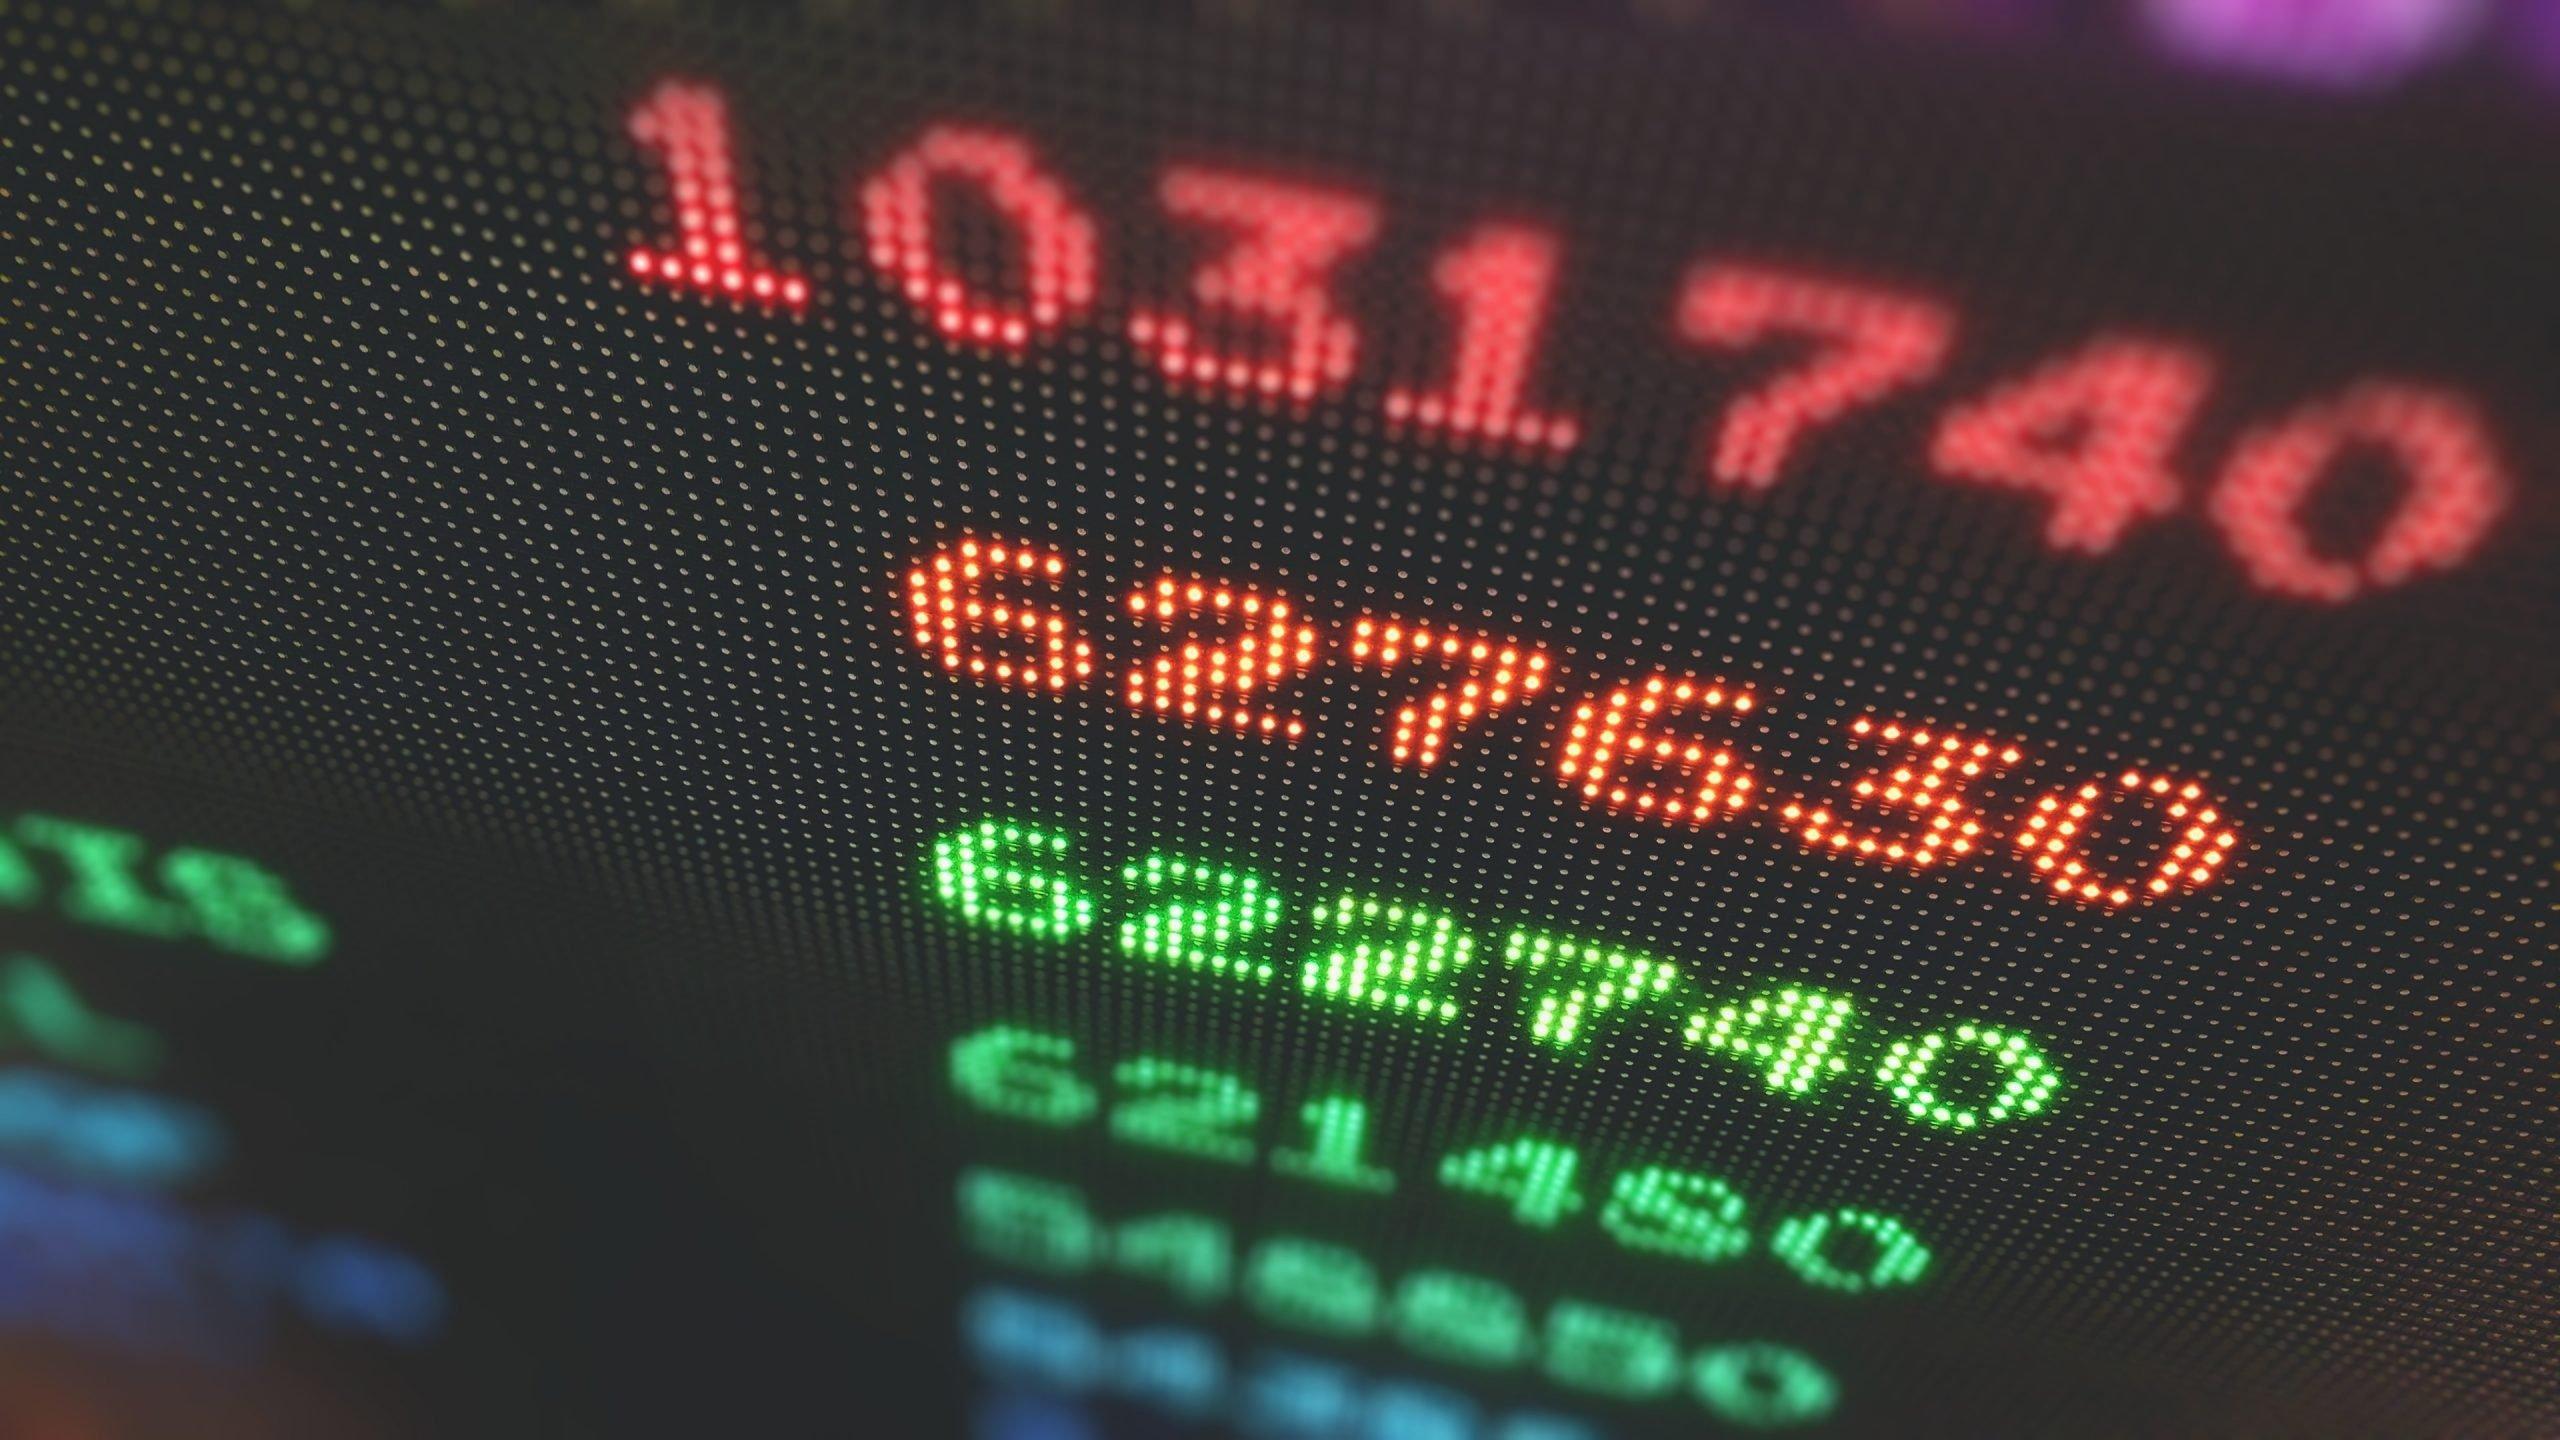 Stocks Gain Nearly 2% As Virus Continues Receding